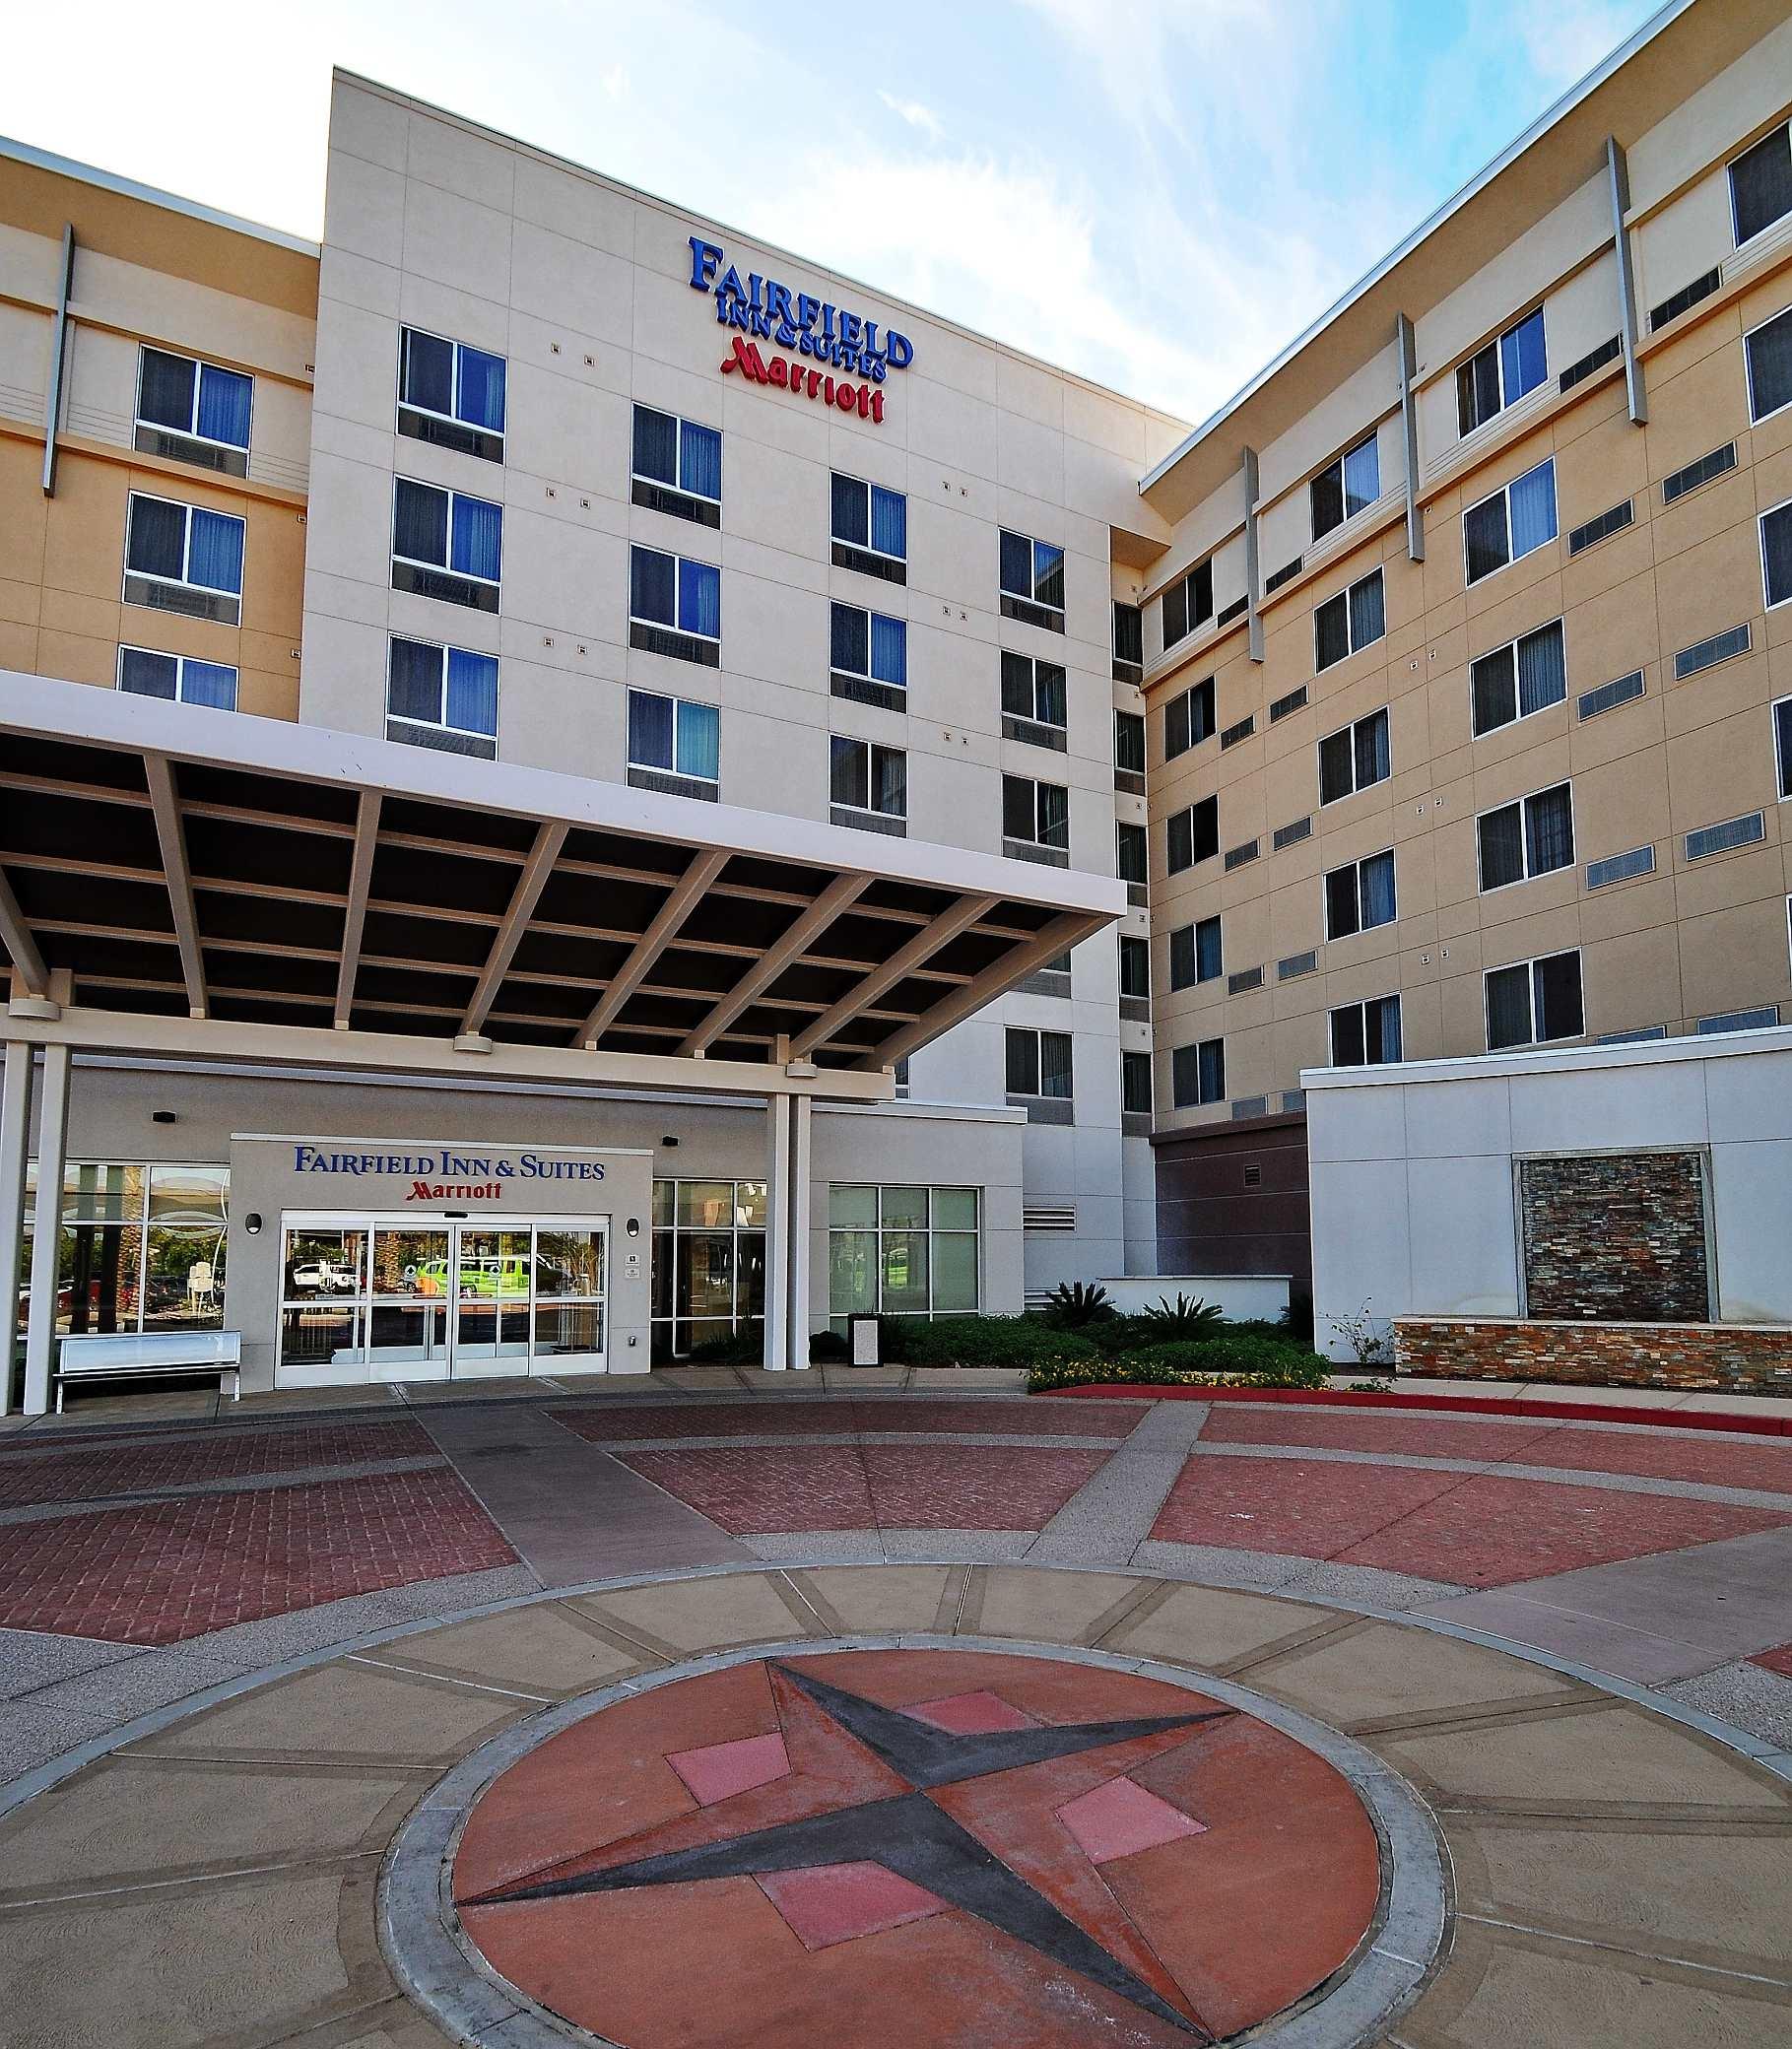 Room Store Chandler: Fairfield Inn & Suites By Marriott Phoenix Chandler